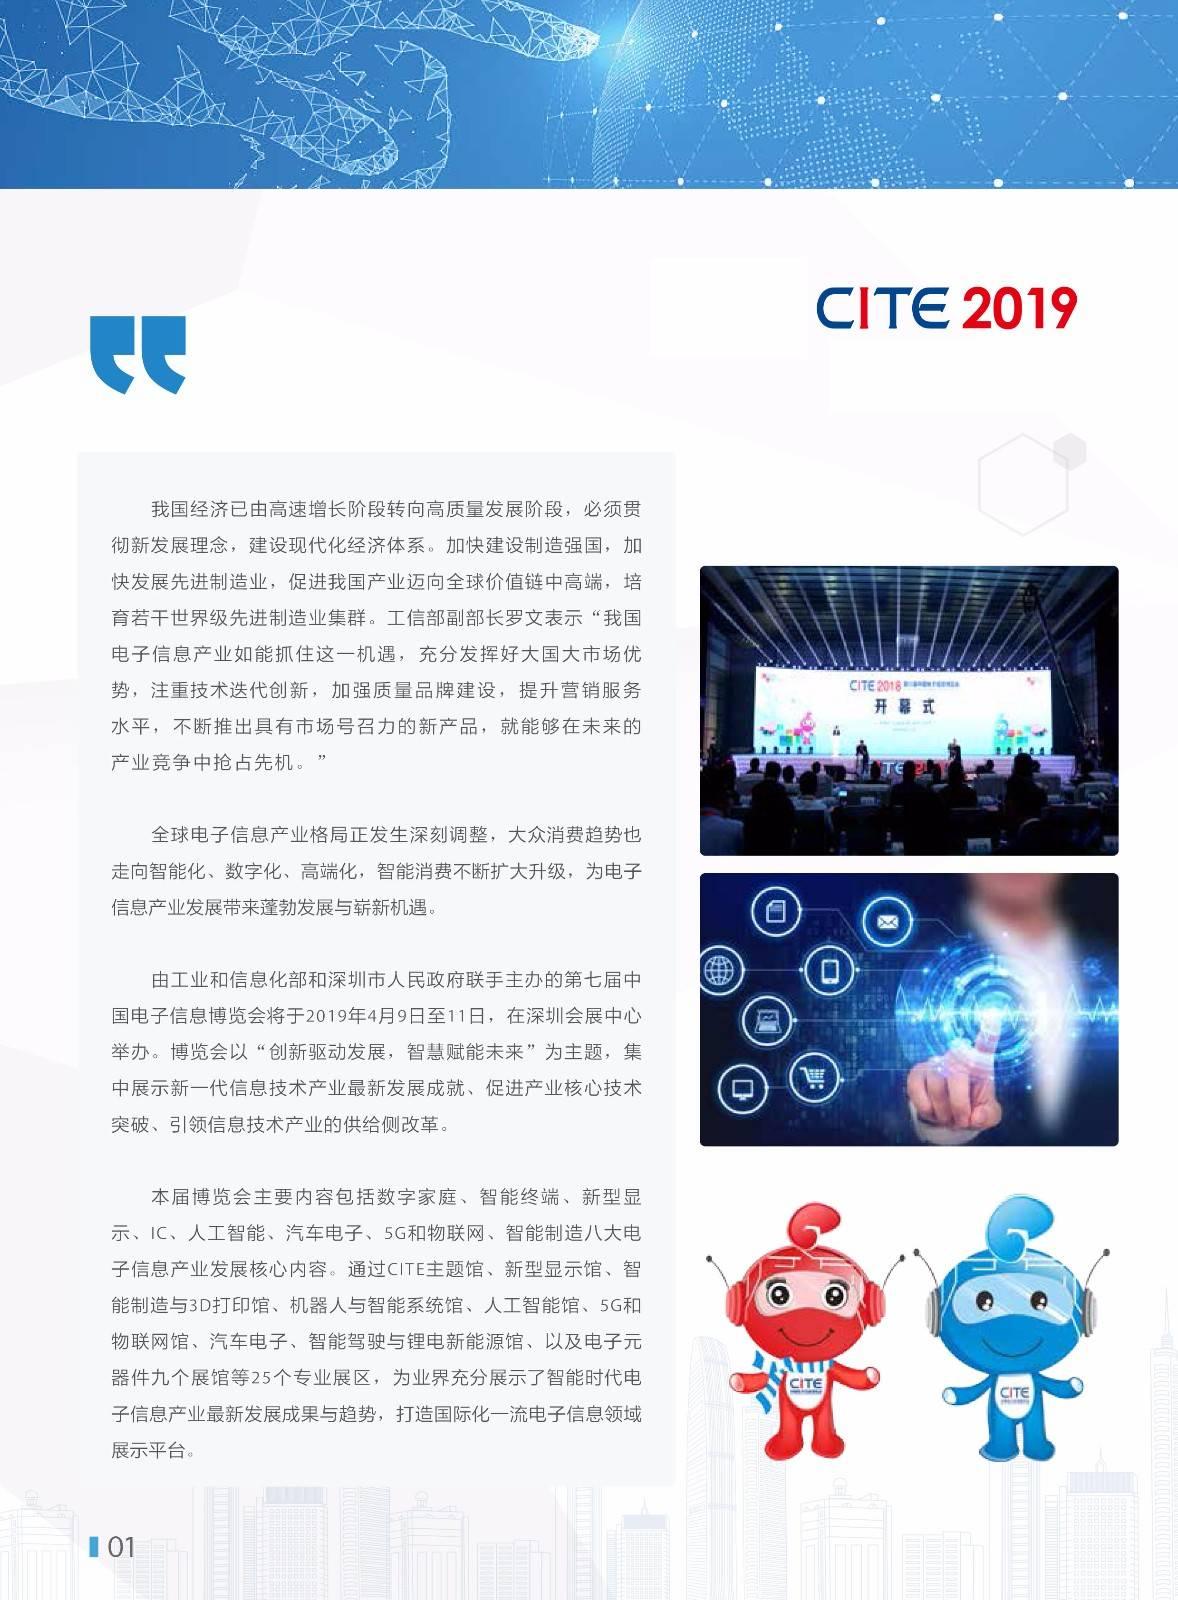 CITE 2019邀请函-2.jpg